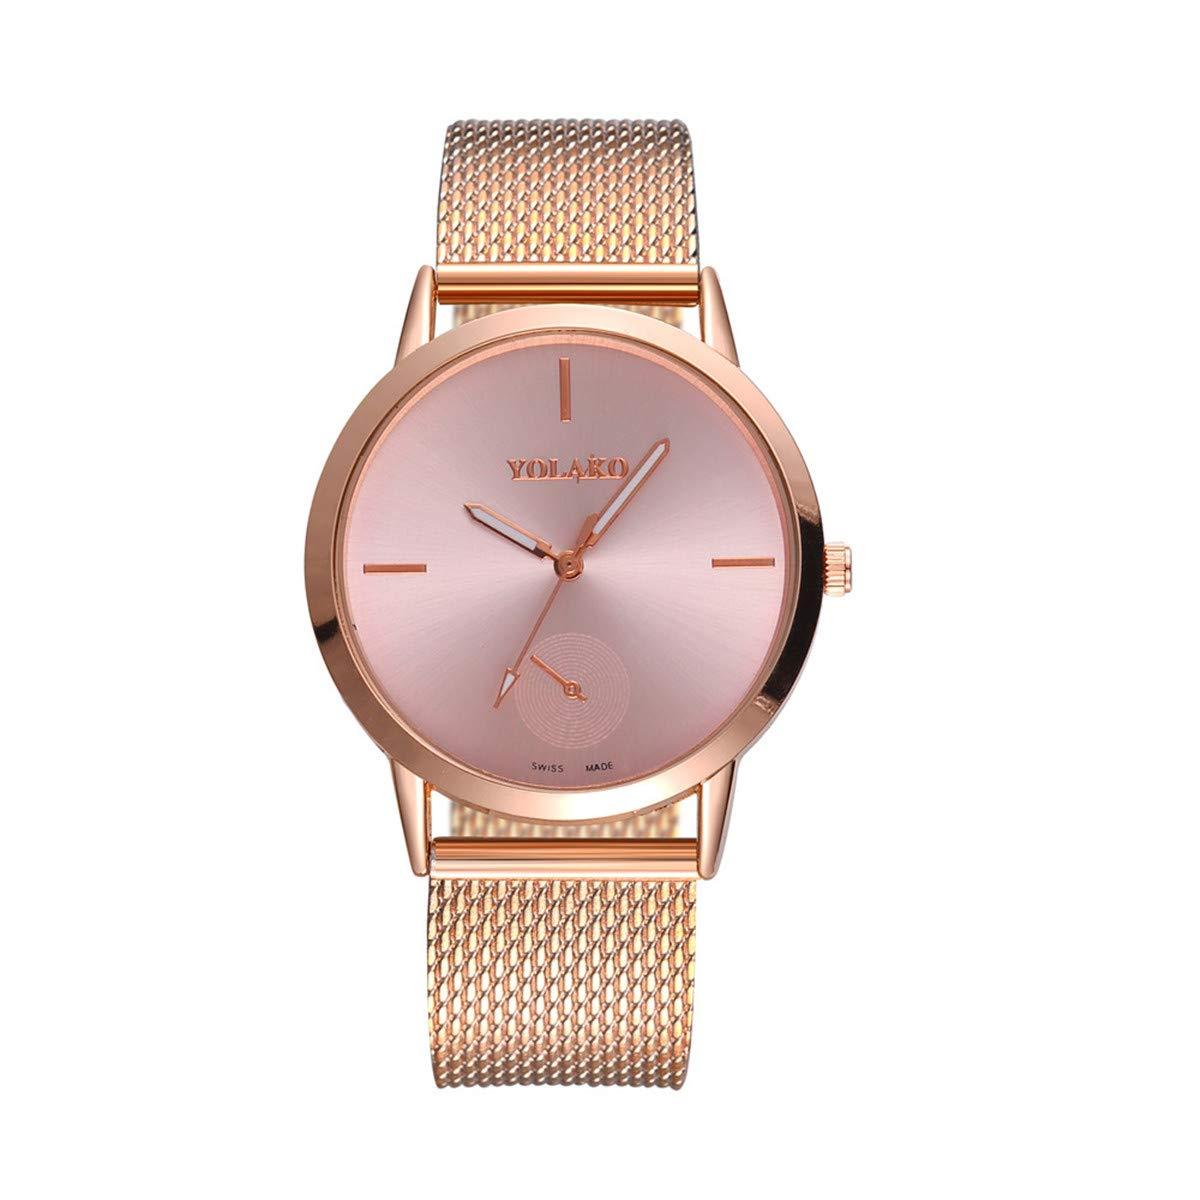 Fainosmny Womens Watch Fashion Watch for Girls Casual General Mesh Belt Watch High Hardness Glass Mirror Wrist Watch (Rose Gold, Free)